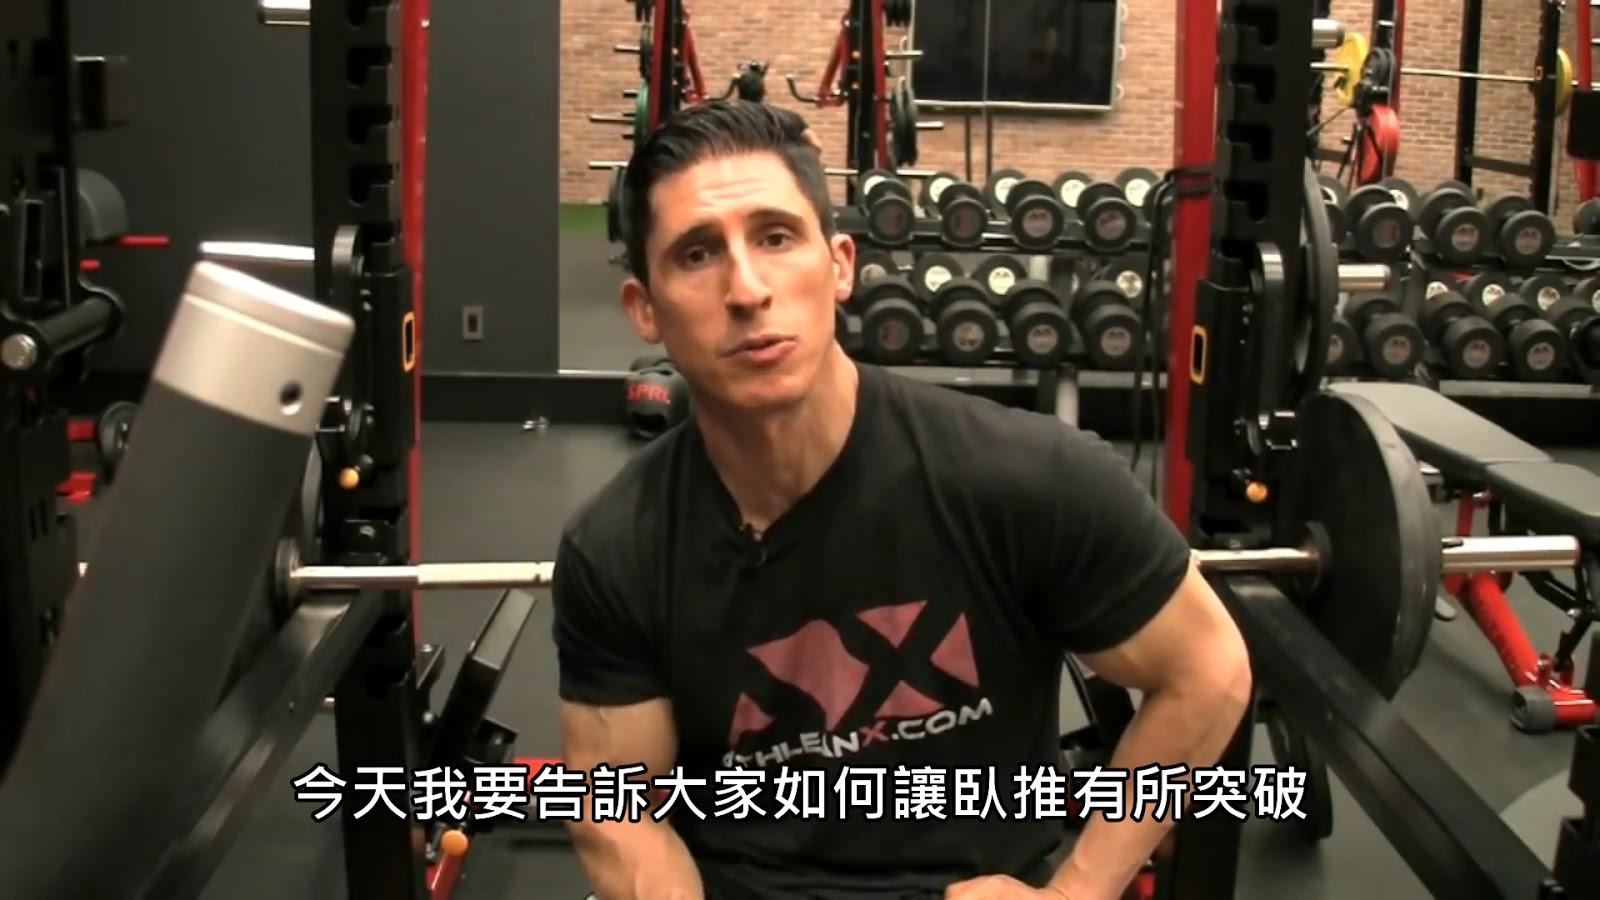 Fitting Room TW: 讓臥推有所突破的訓練流程 (中文字幕)